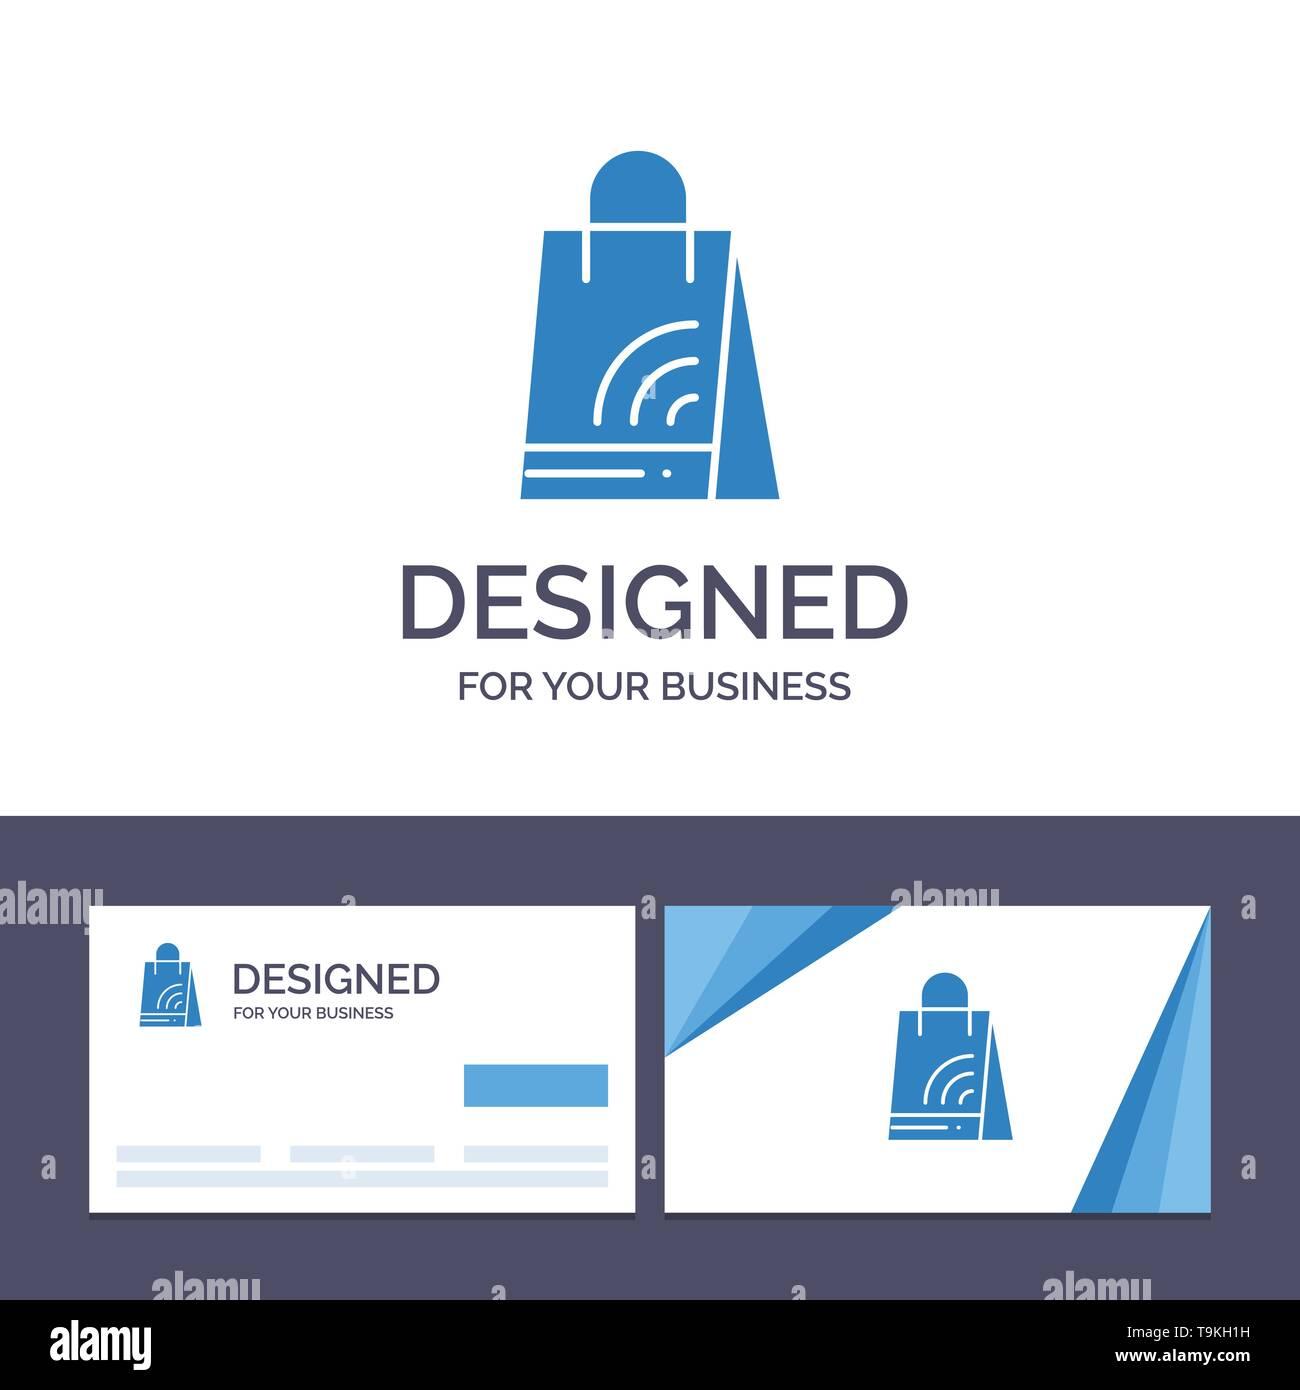 Creative Business Card and Logo template Bag, Handbag, Wifi, Shopping Vector Illustration - Stock Image